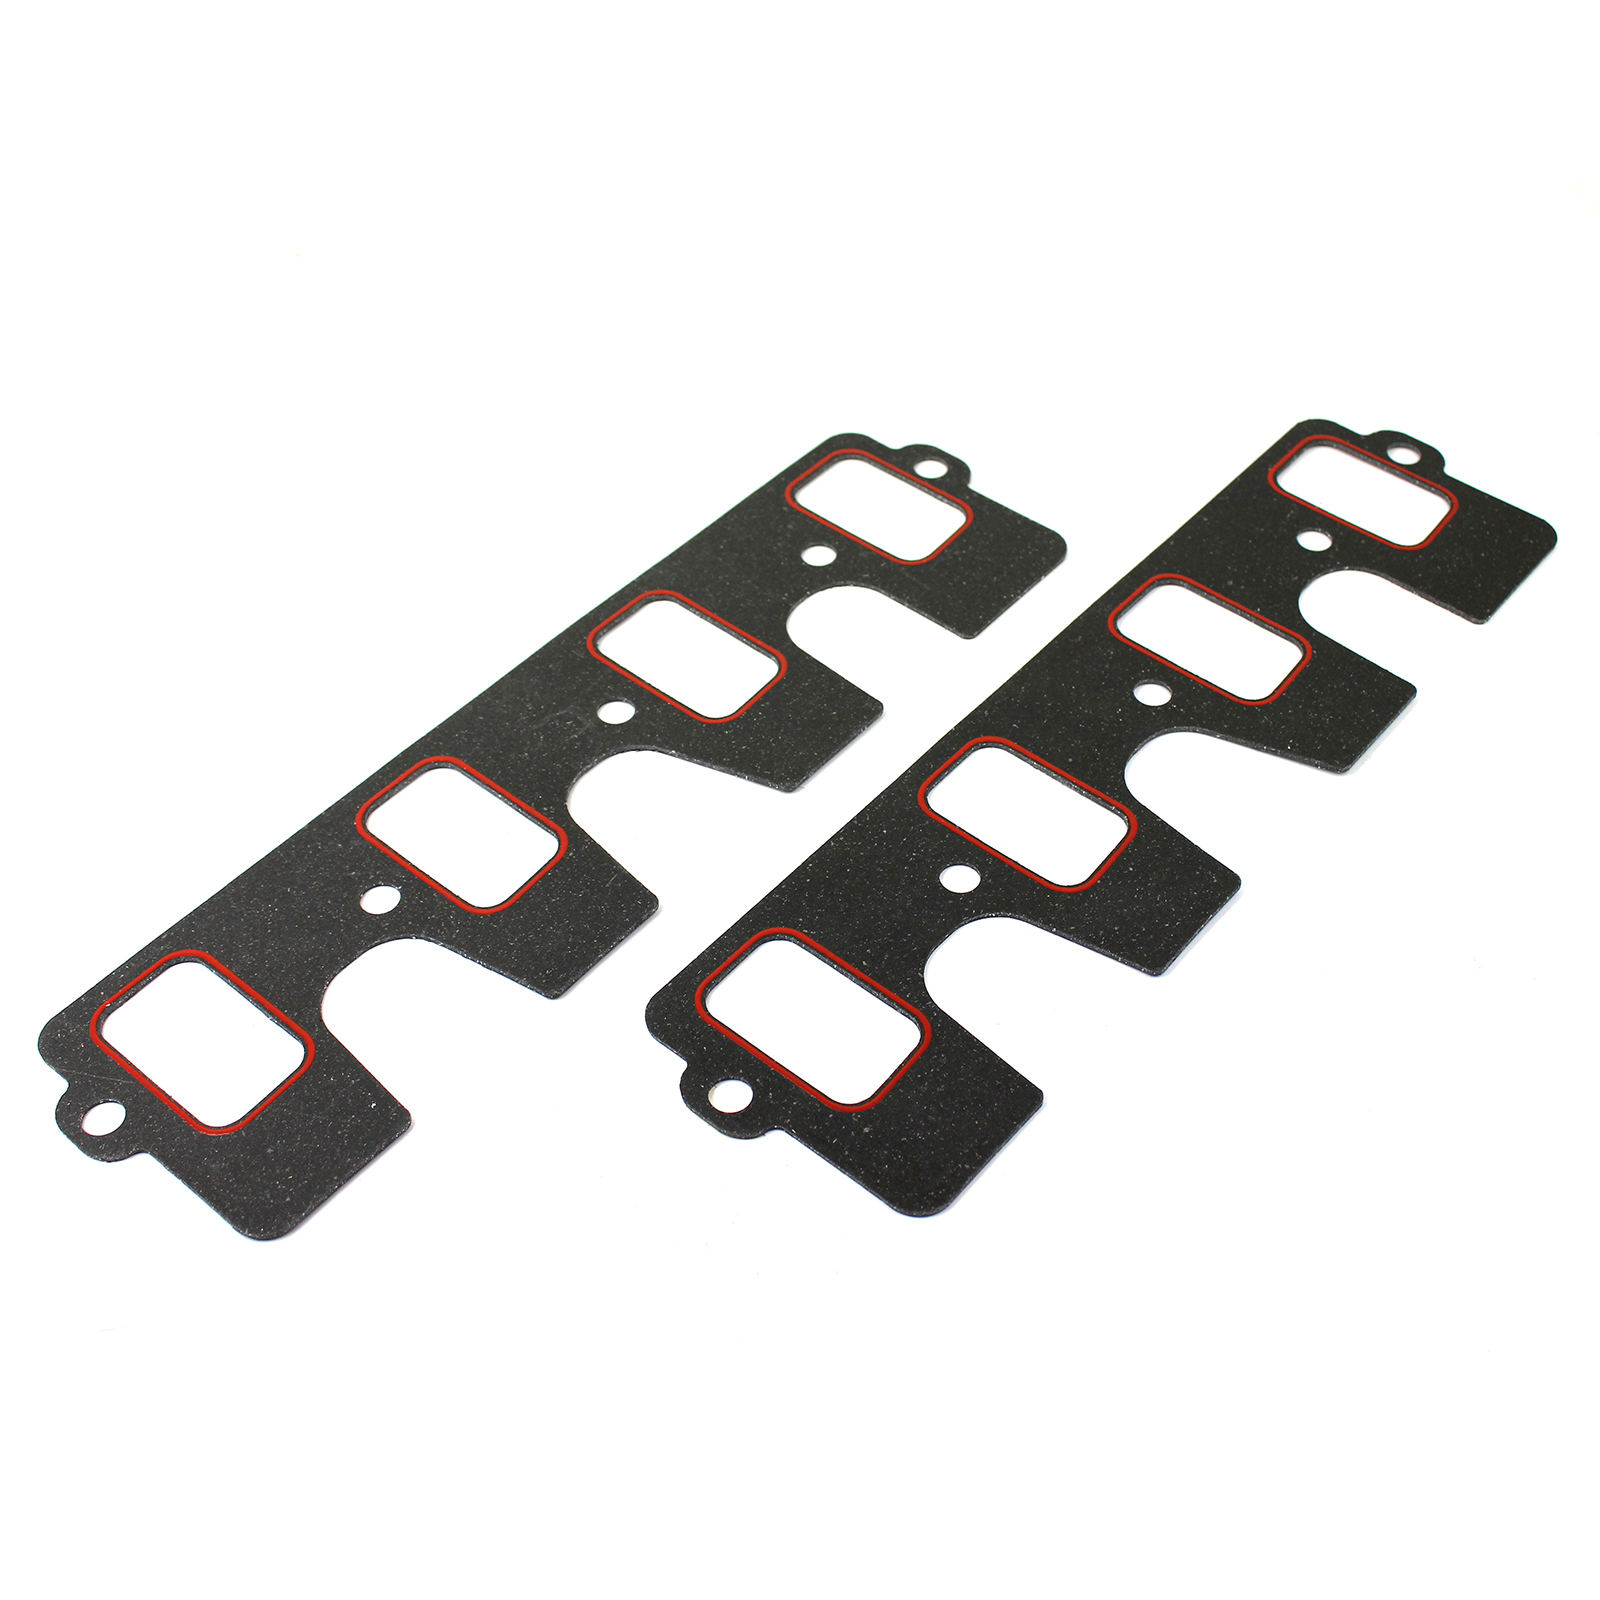 "Chevy SBC LS7 7.0L Intake Manifold Gasket Set (1208) 1.45"" x 2.45"" x 0.045"""